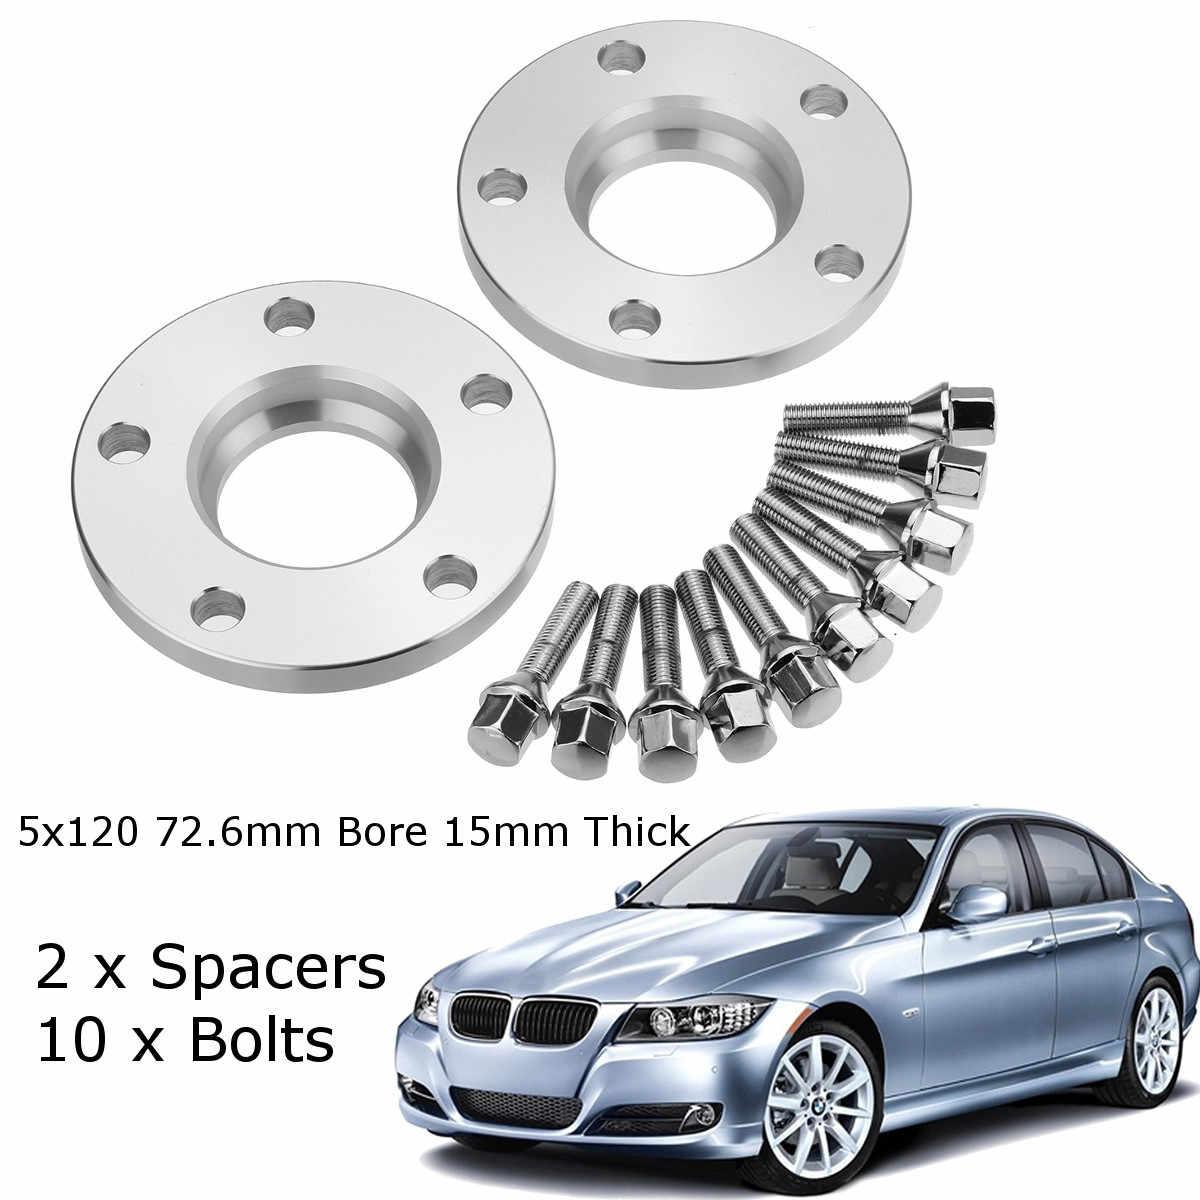 Car 15mm Wheel Spacer Adapter 5x120mm Tire Spacer Aluminum For Bmw 1 3 5 6 7 8 Series E82 E88 E30 E36 E46 E28 E34 Tire Accessories Aliexpress